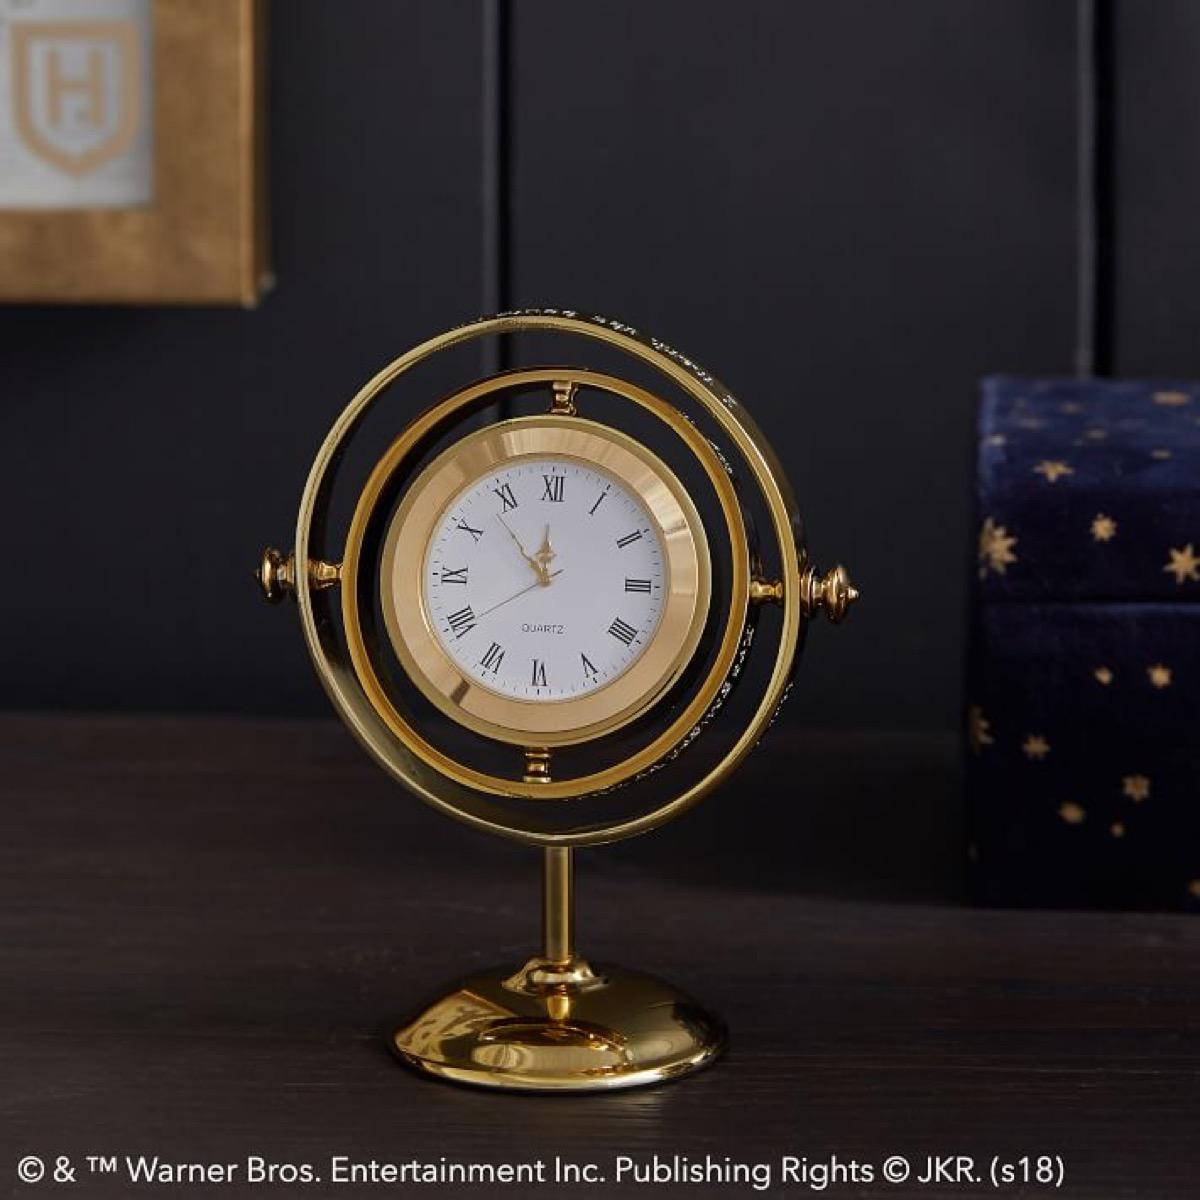 Harry Potter Time Turner Clock {Gifts for Harry Potter Fans}